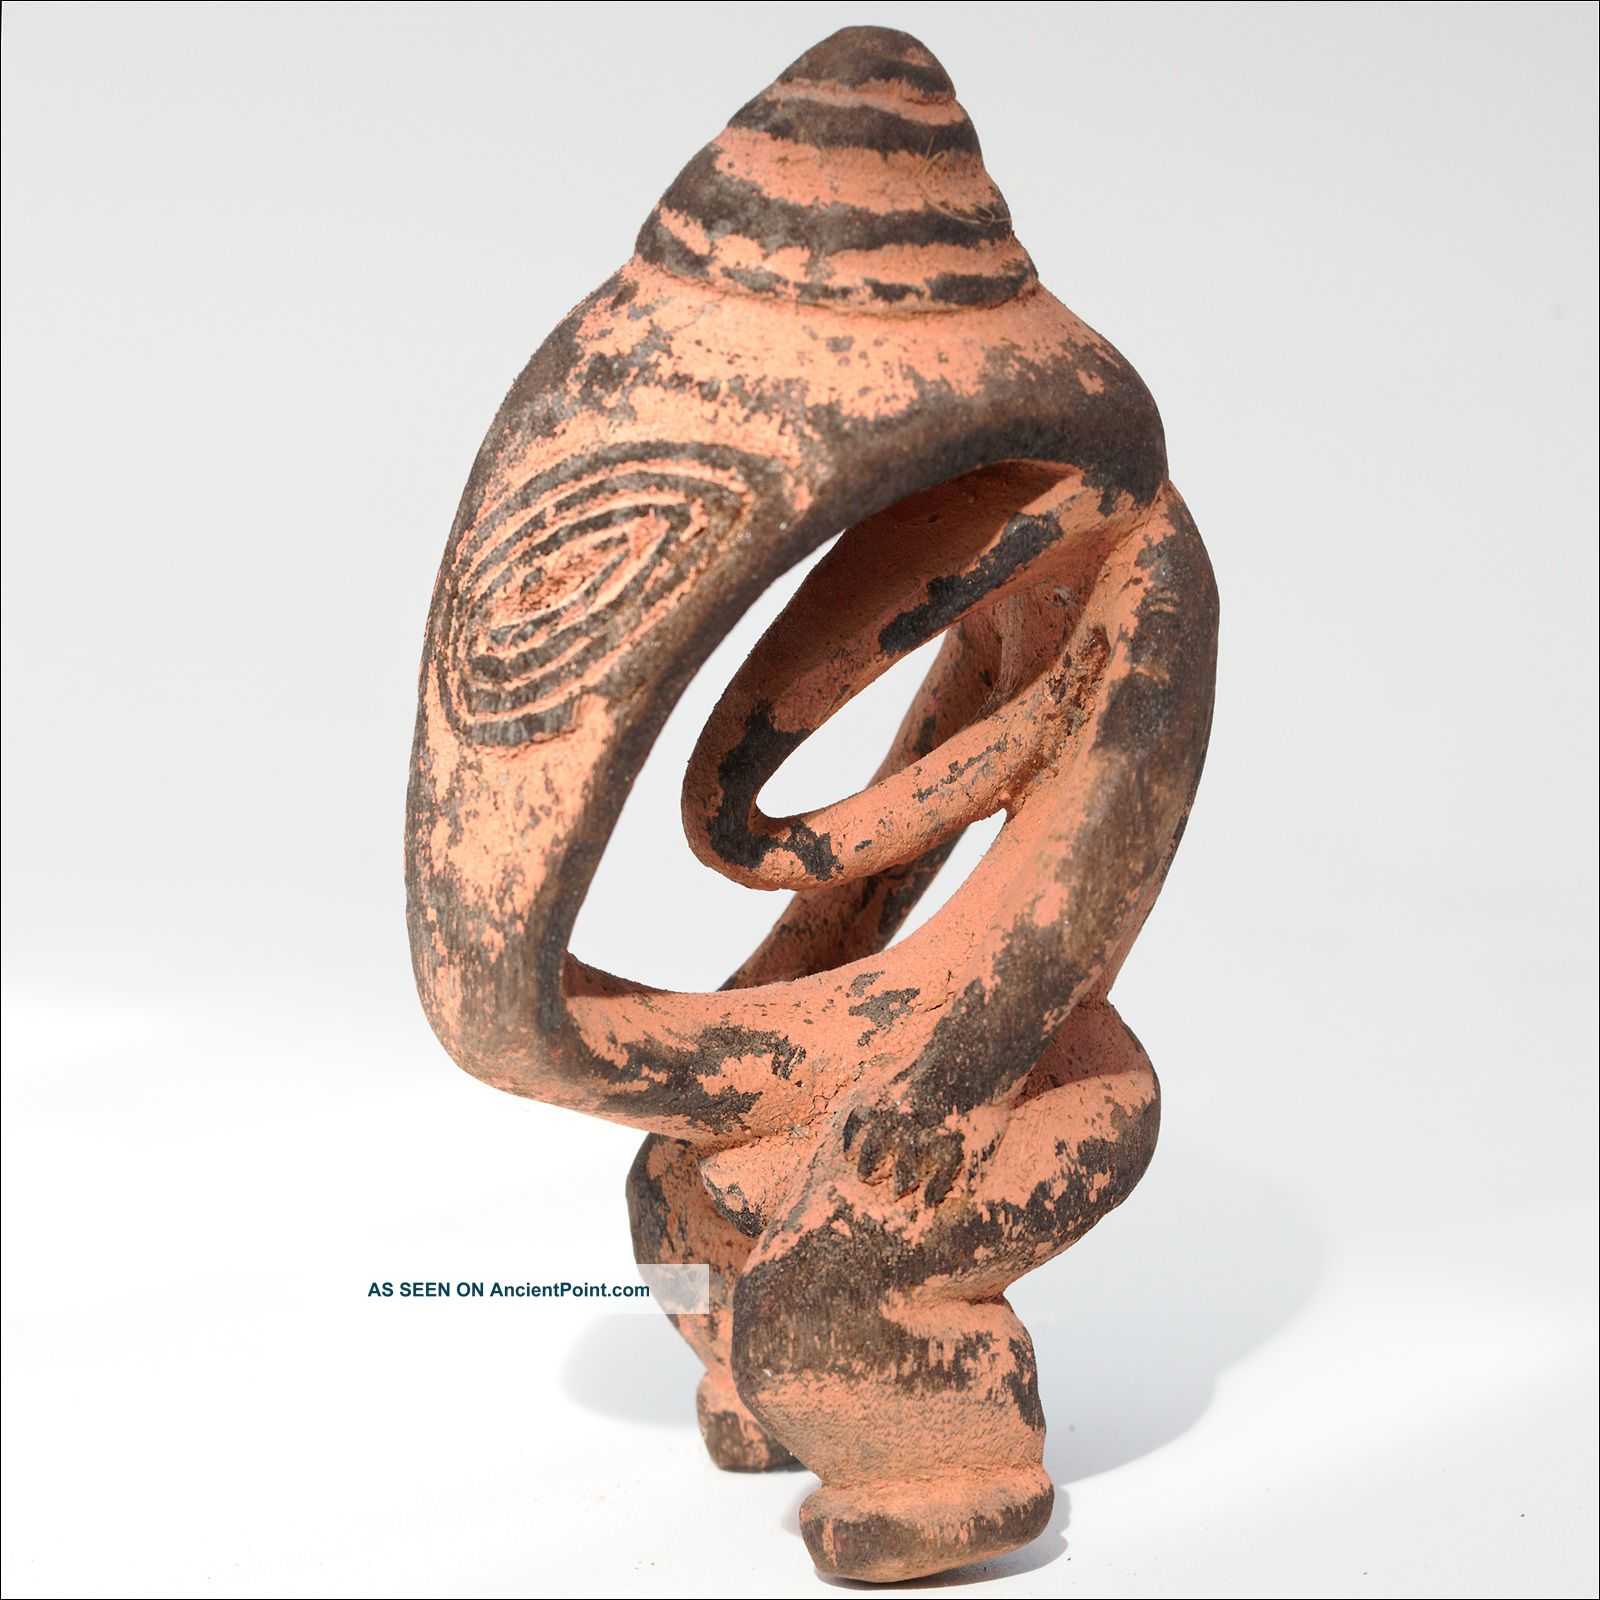 Png Lower Sepik River Power Figure Amulet - Papua Guinea Carving Pacific Islands & Oceania photo